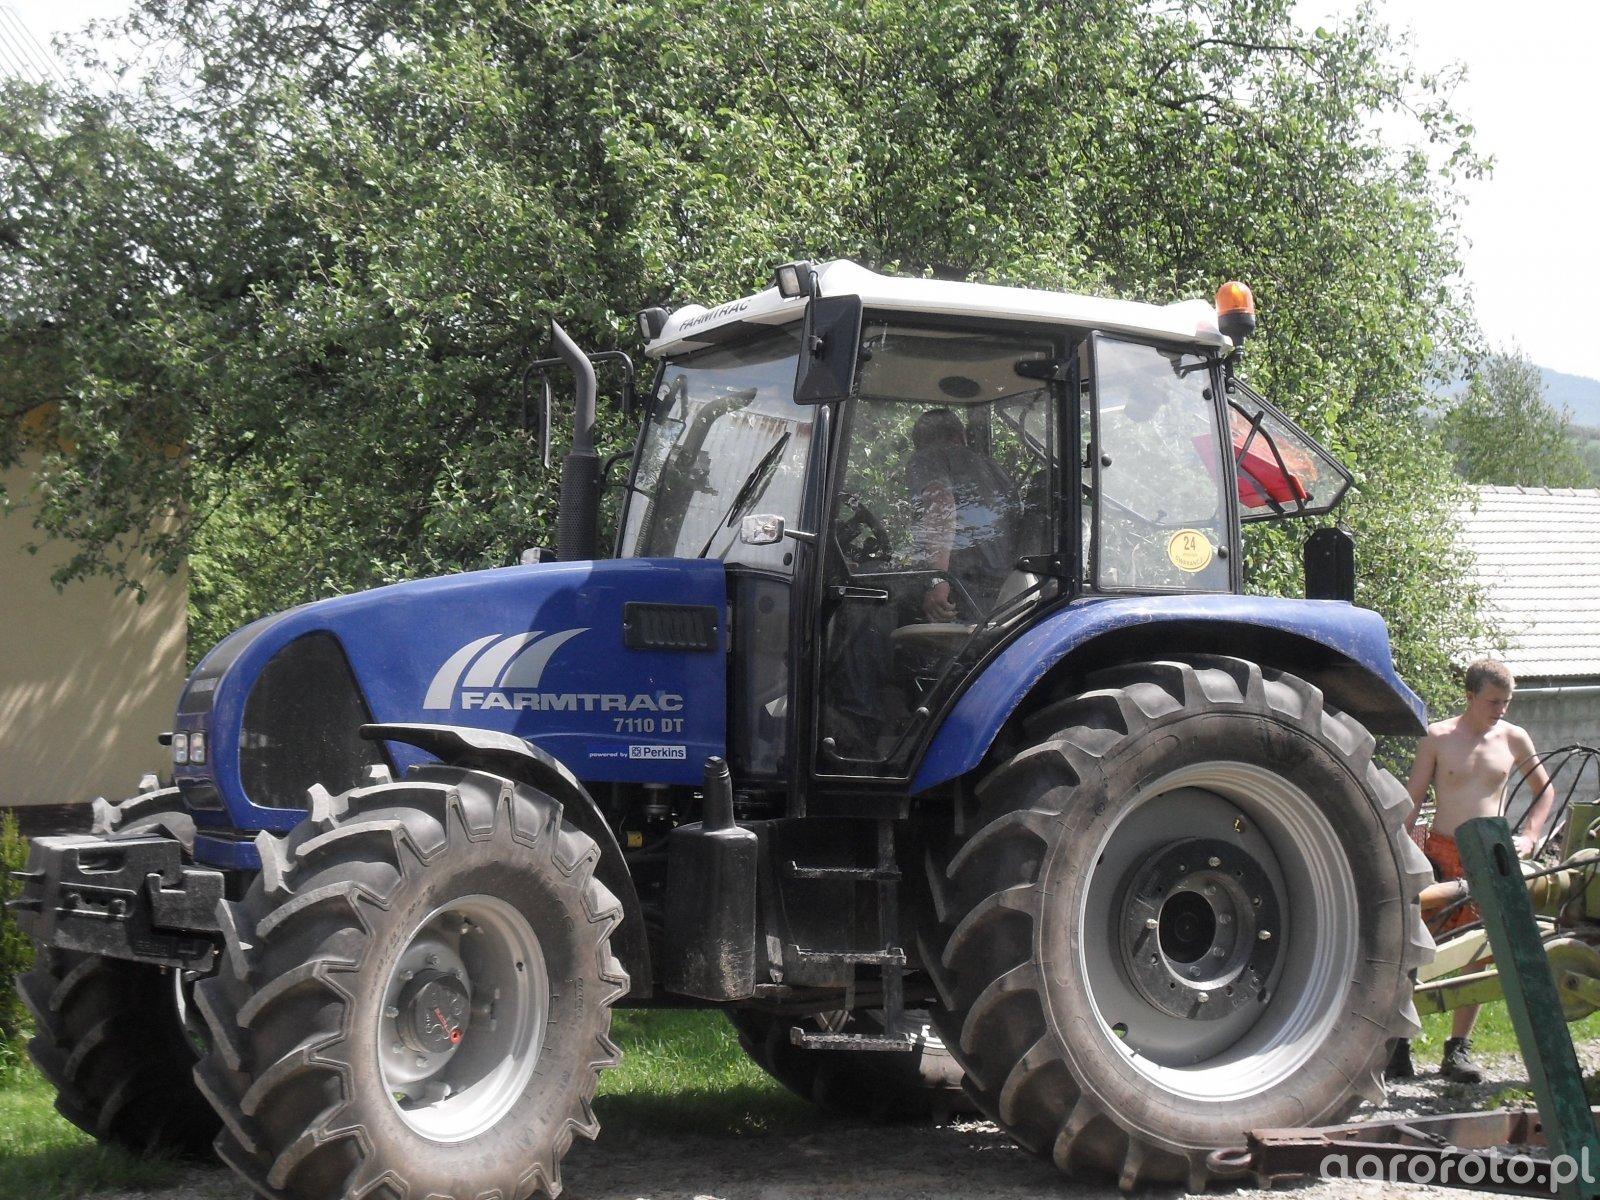 Farmtrac 7110